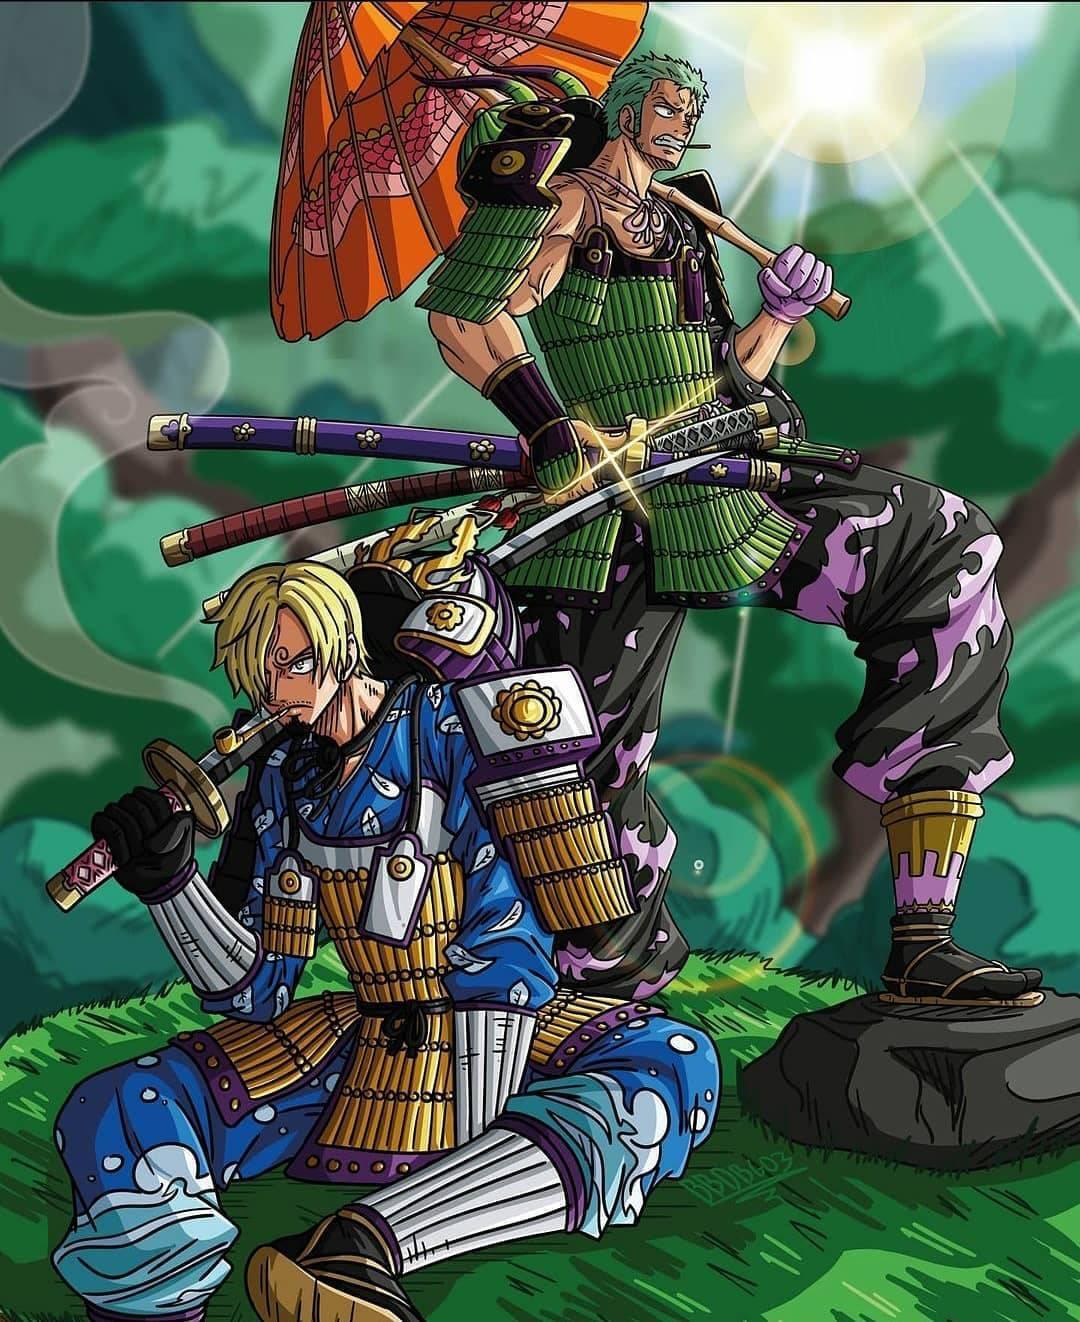 Wallpaper Anime, Wallpaper Anime HD Terbaru